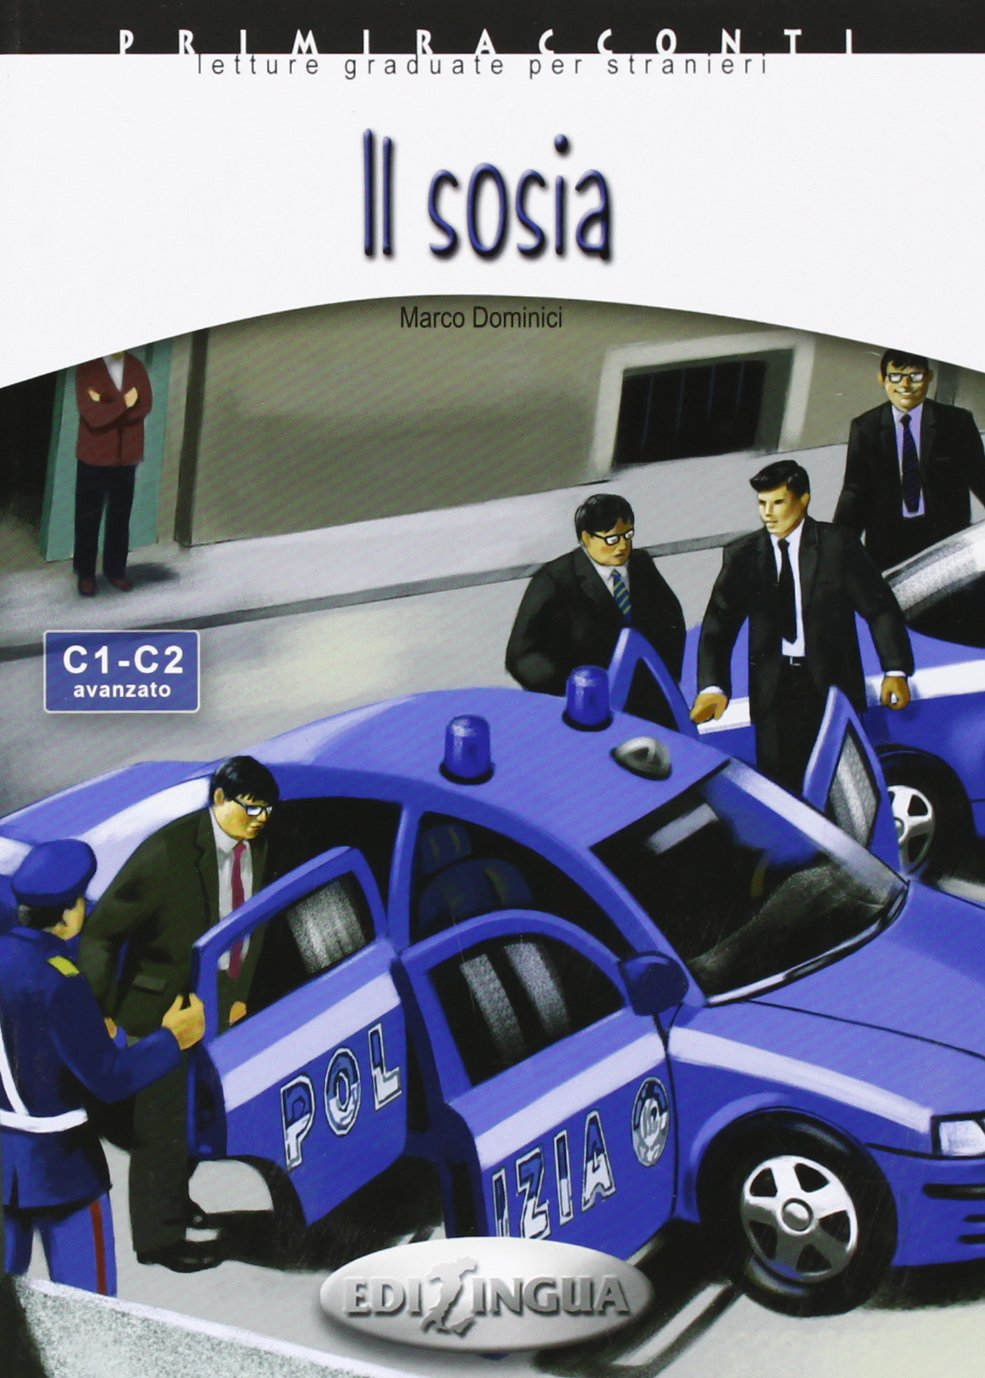 Primiracconti: Il Sosia - Адаптирана книжка на италиански език за ниво C1-C2